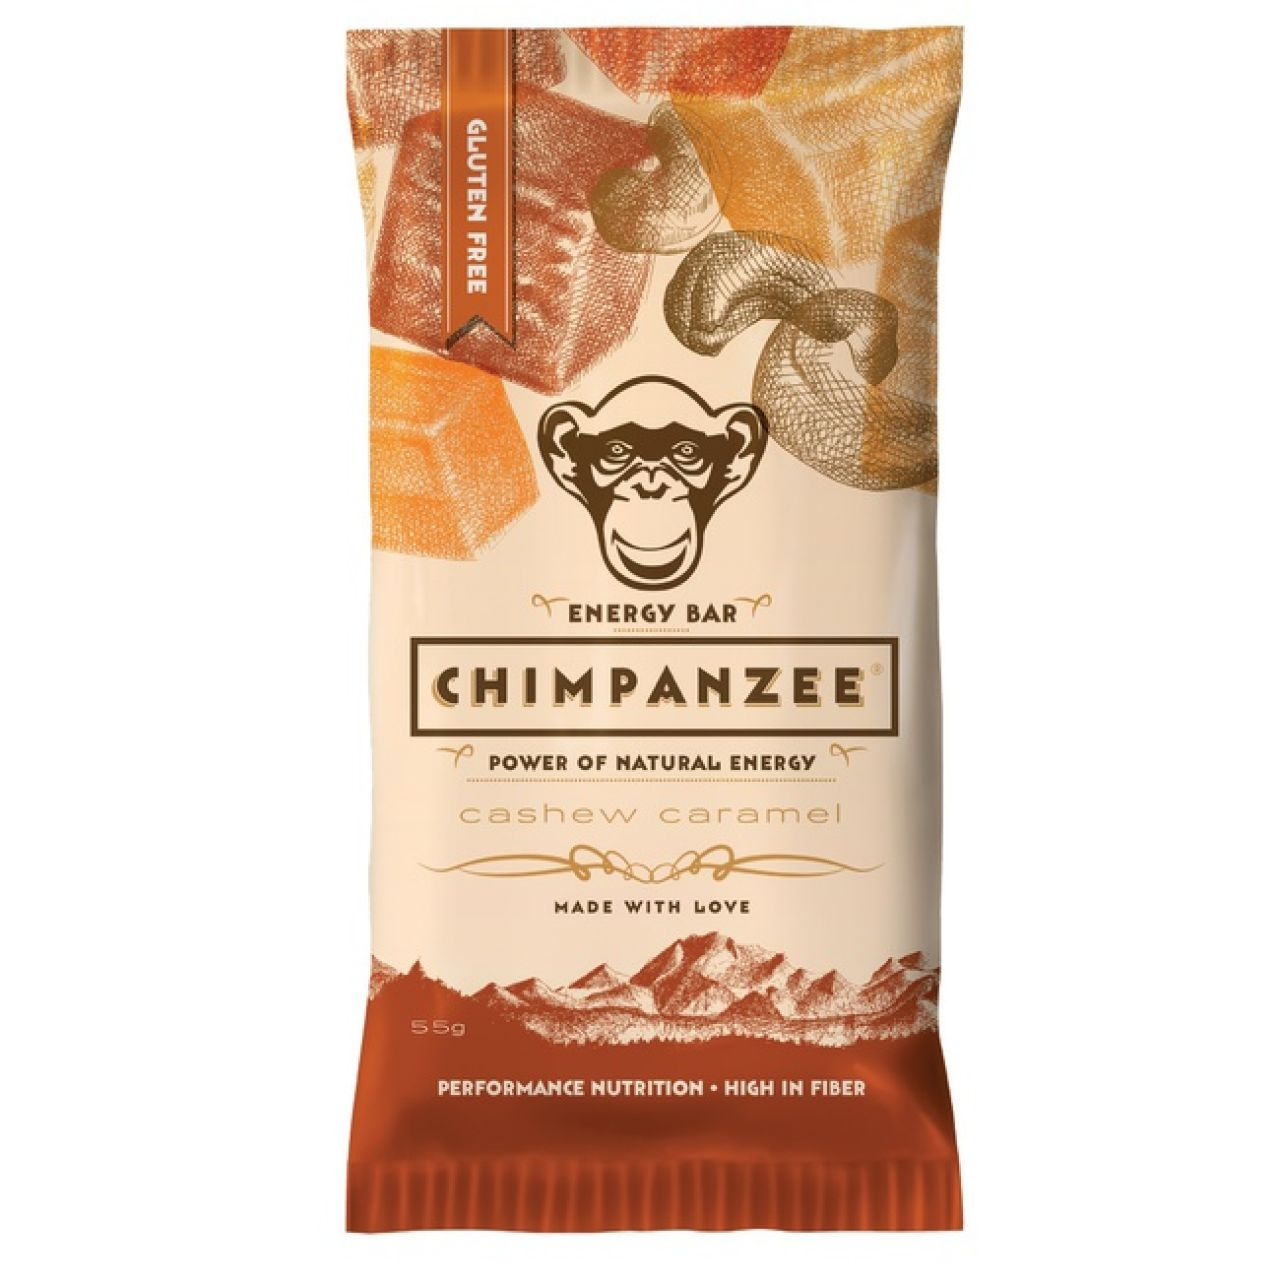 Chimpanzee CHIMPANZEE ENERGY BAR Cashew Caramel 55g